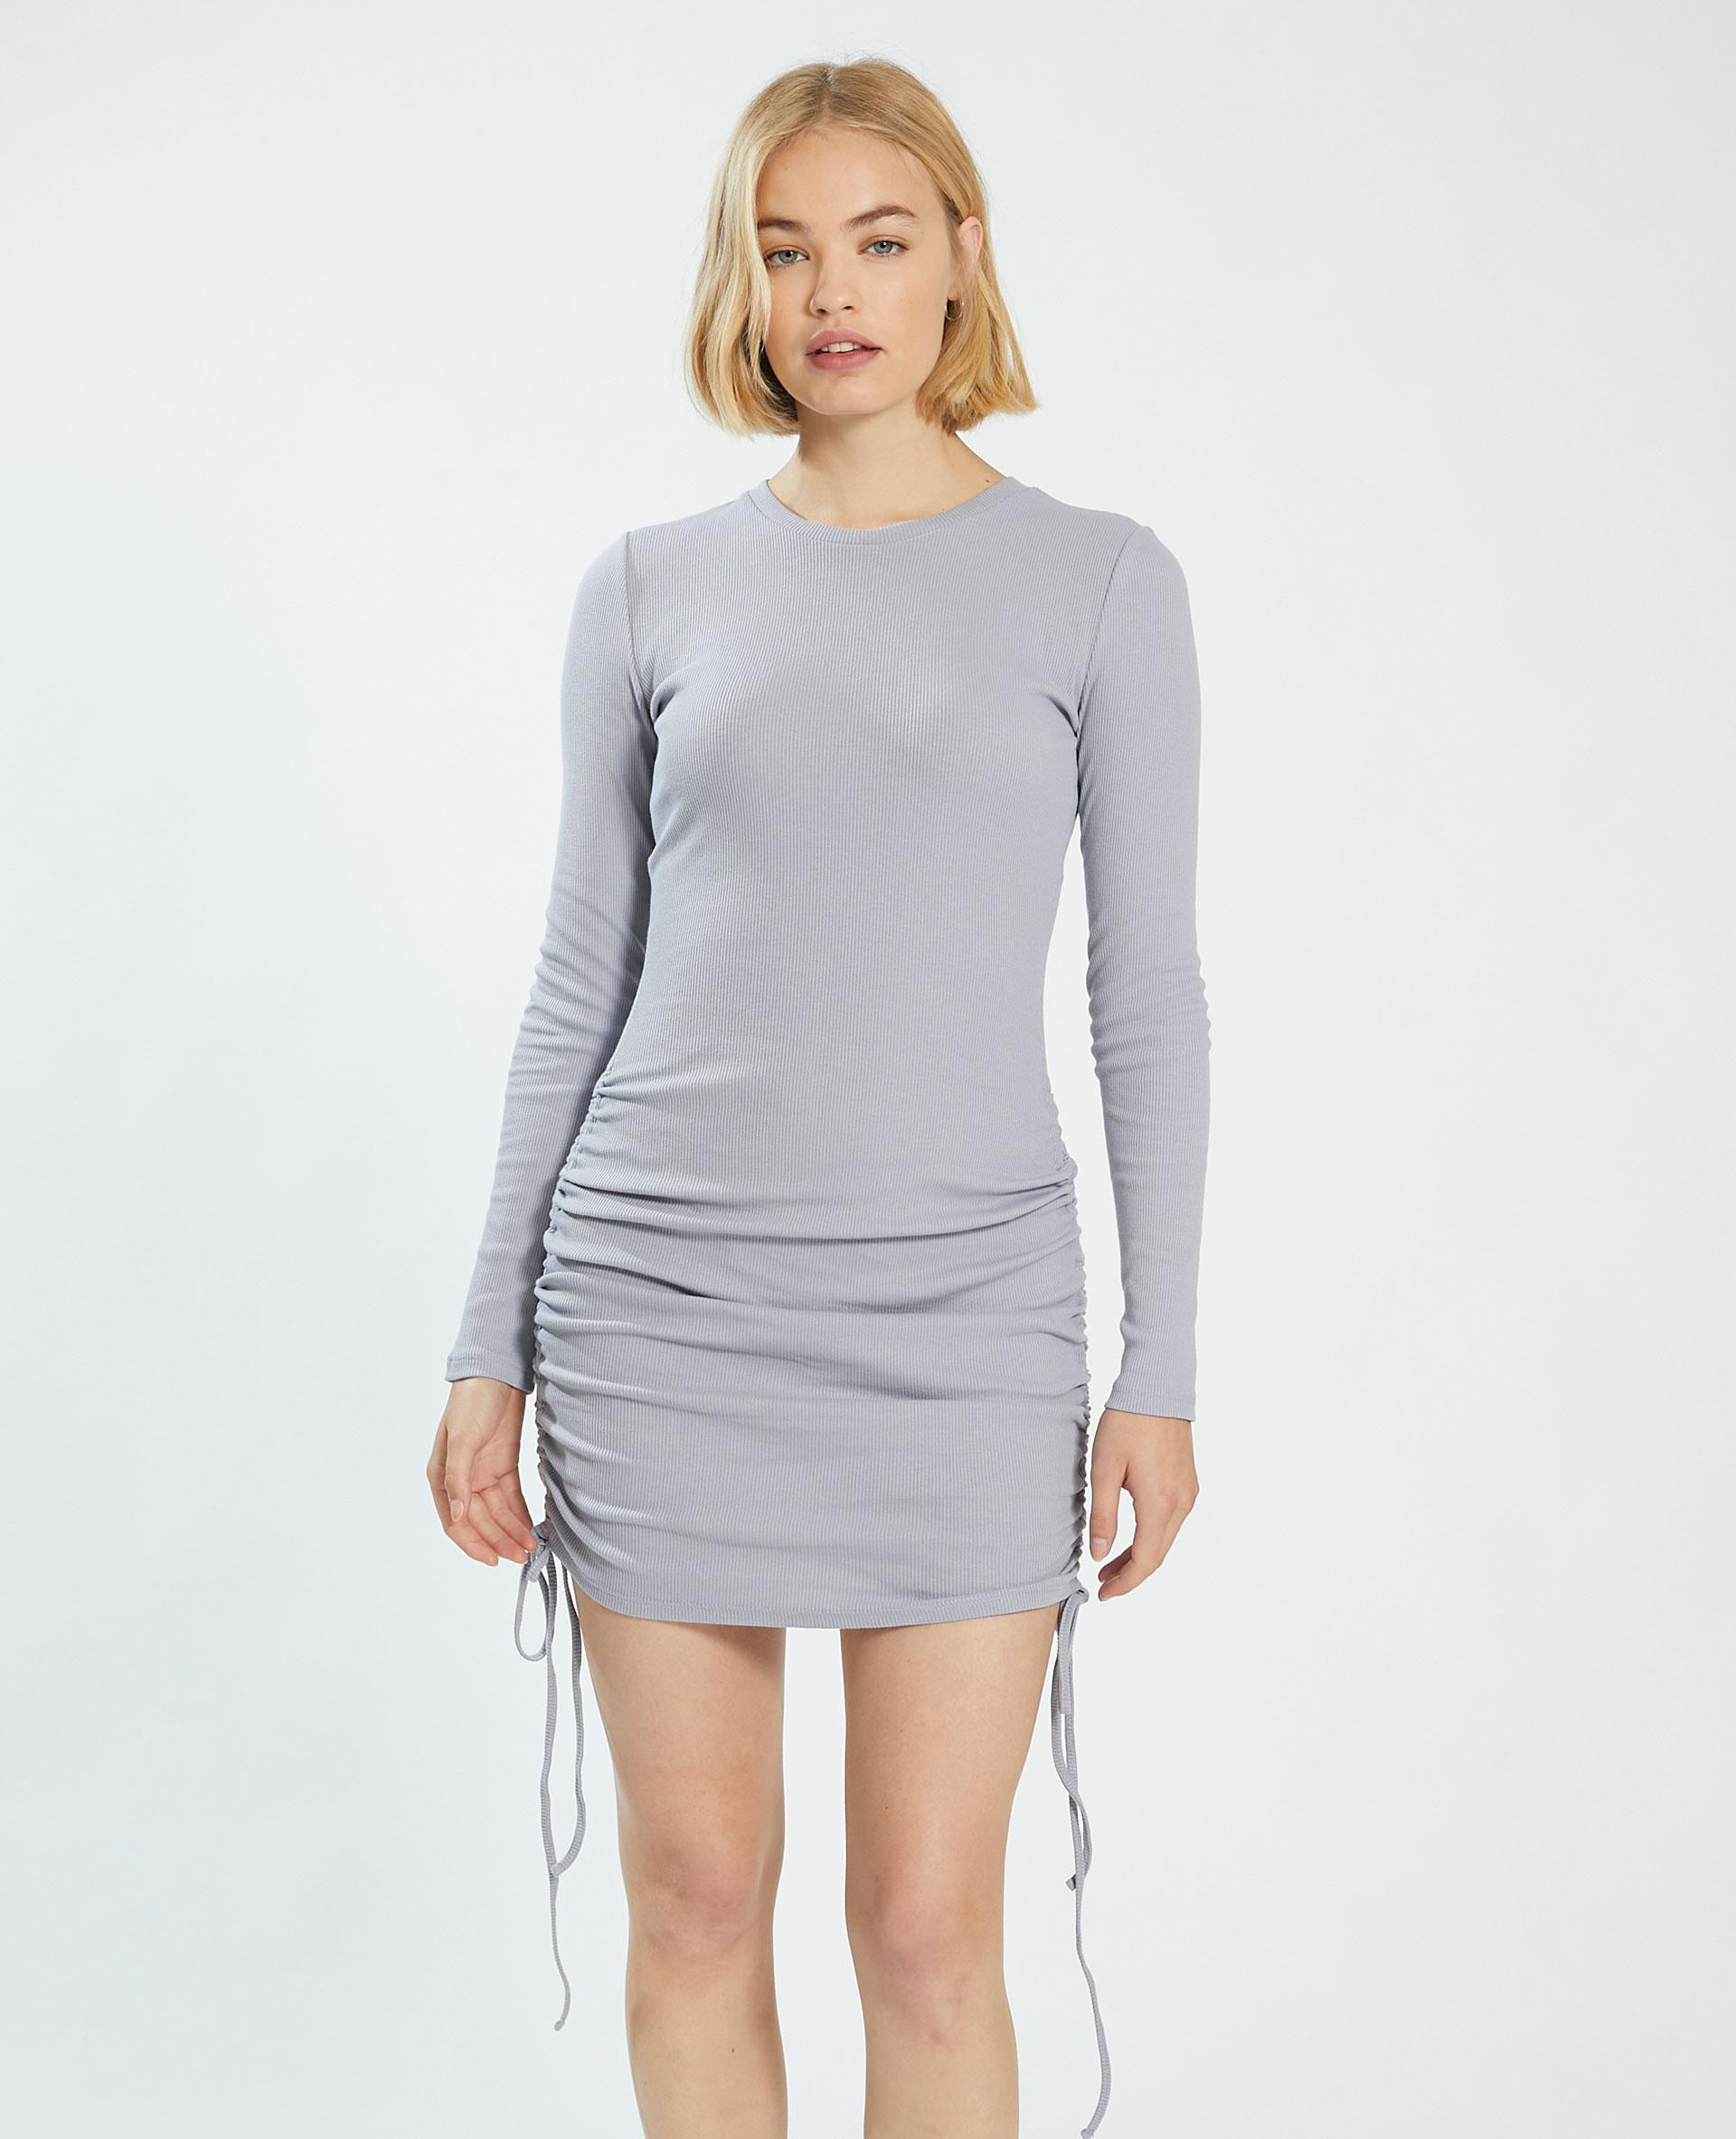 Robe côtelée gris - Pimkie